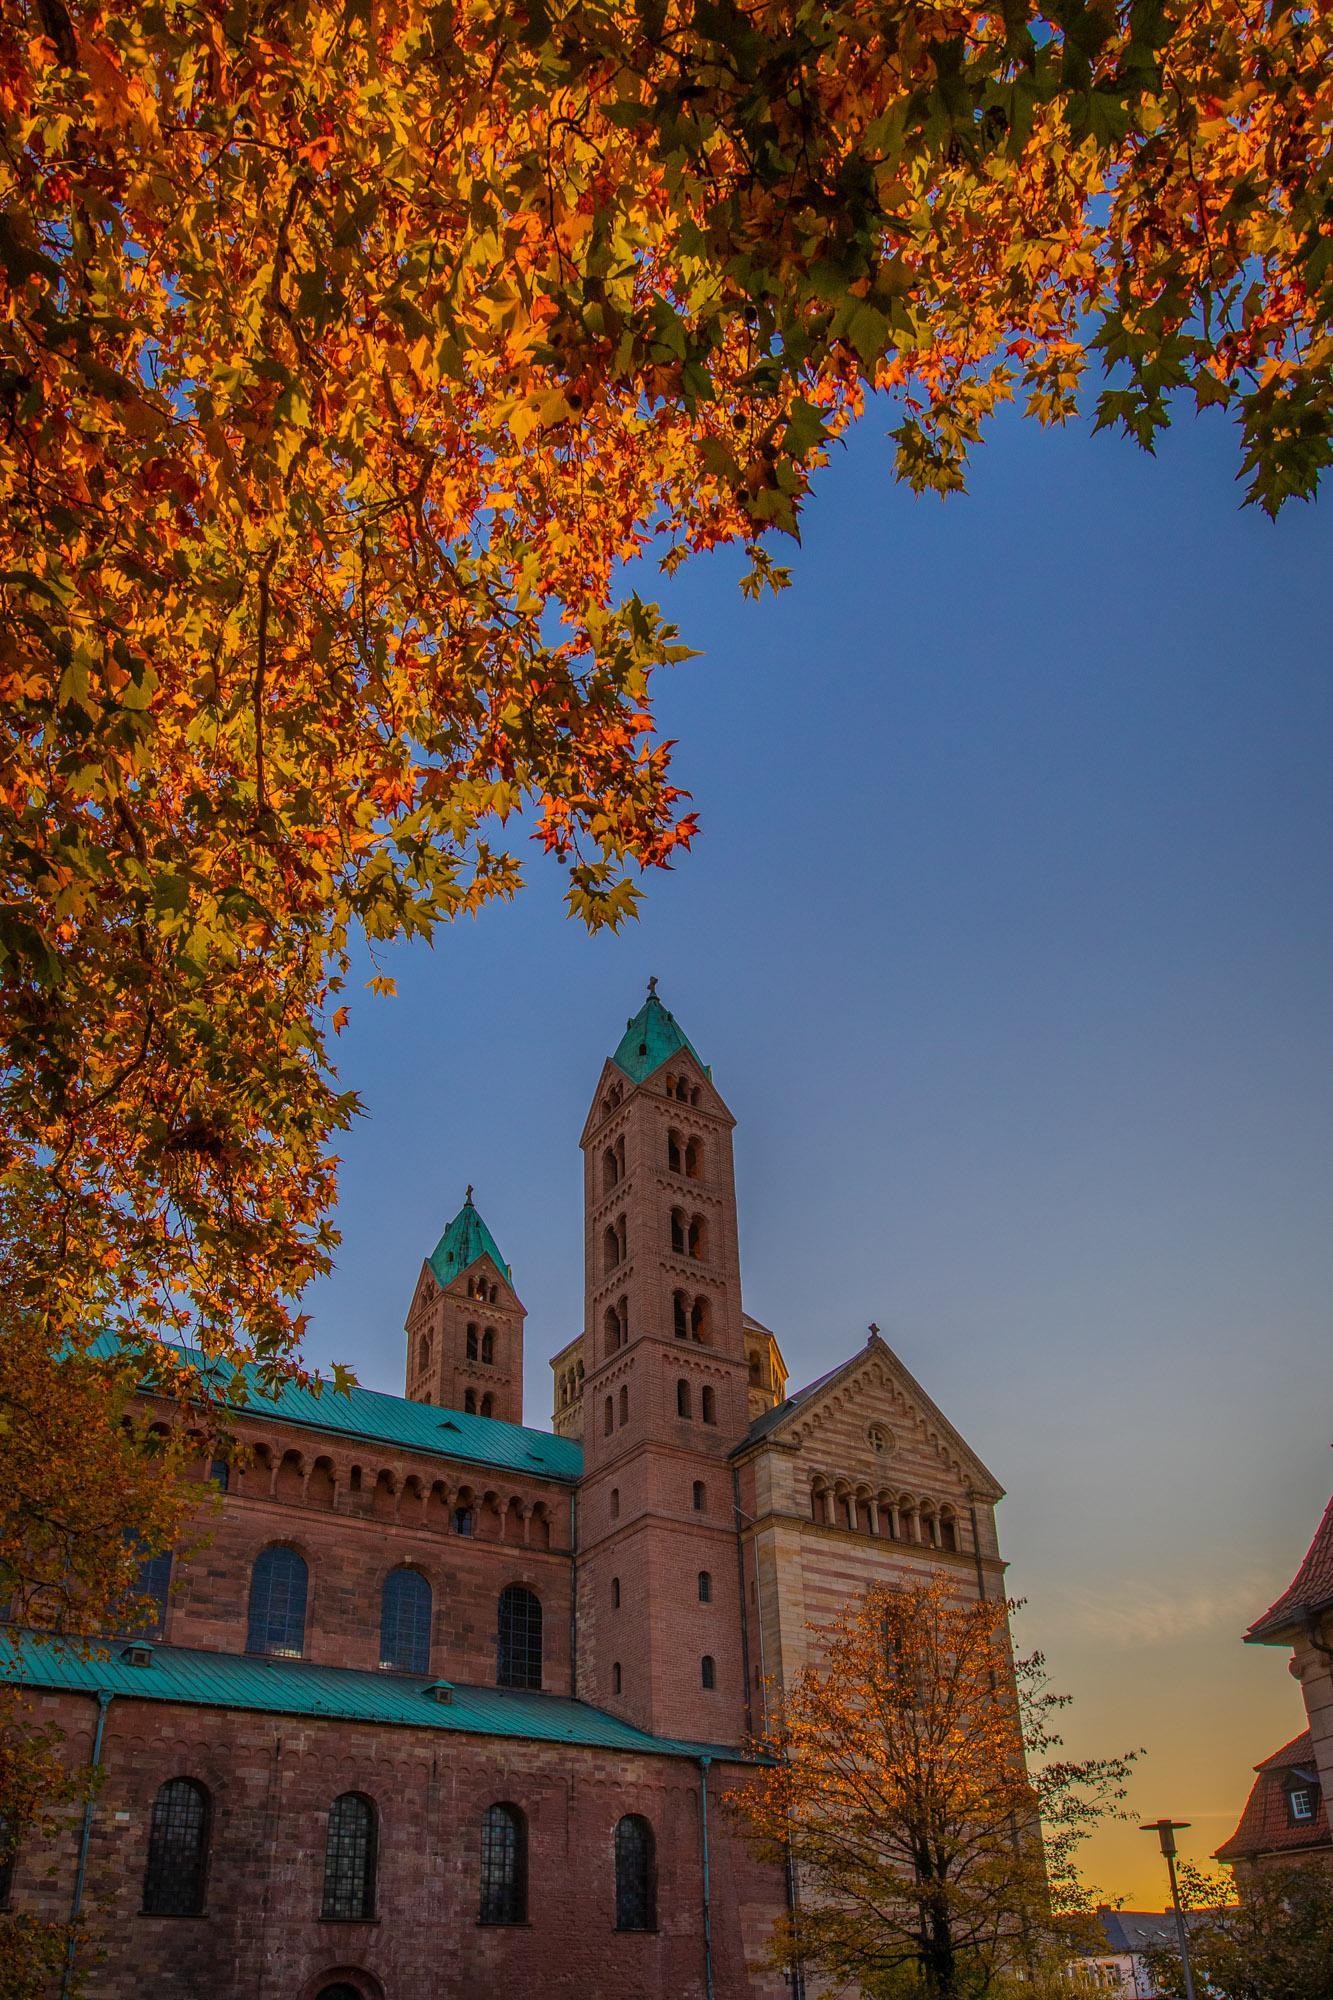 Speyerer Dom im Herbst 2020 Klehmann INTERNET06-2